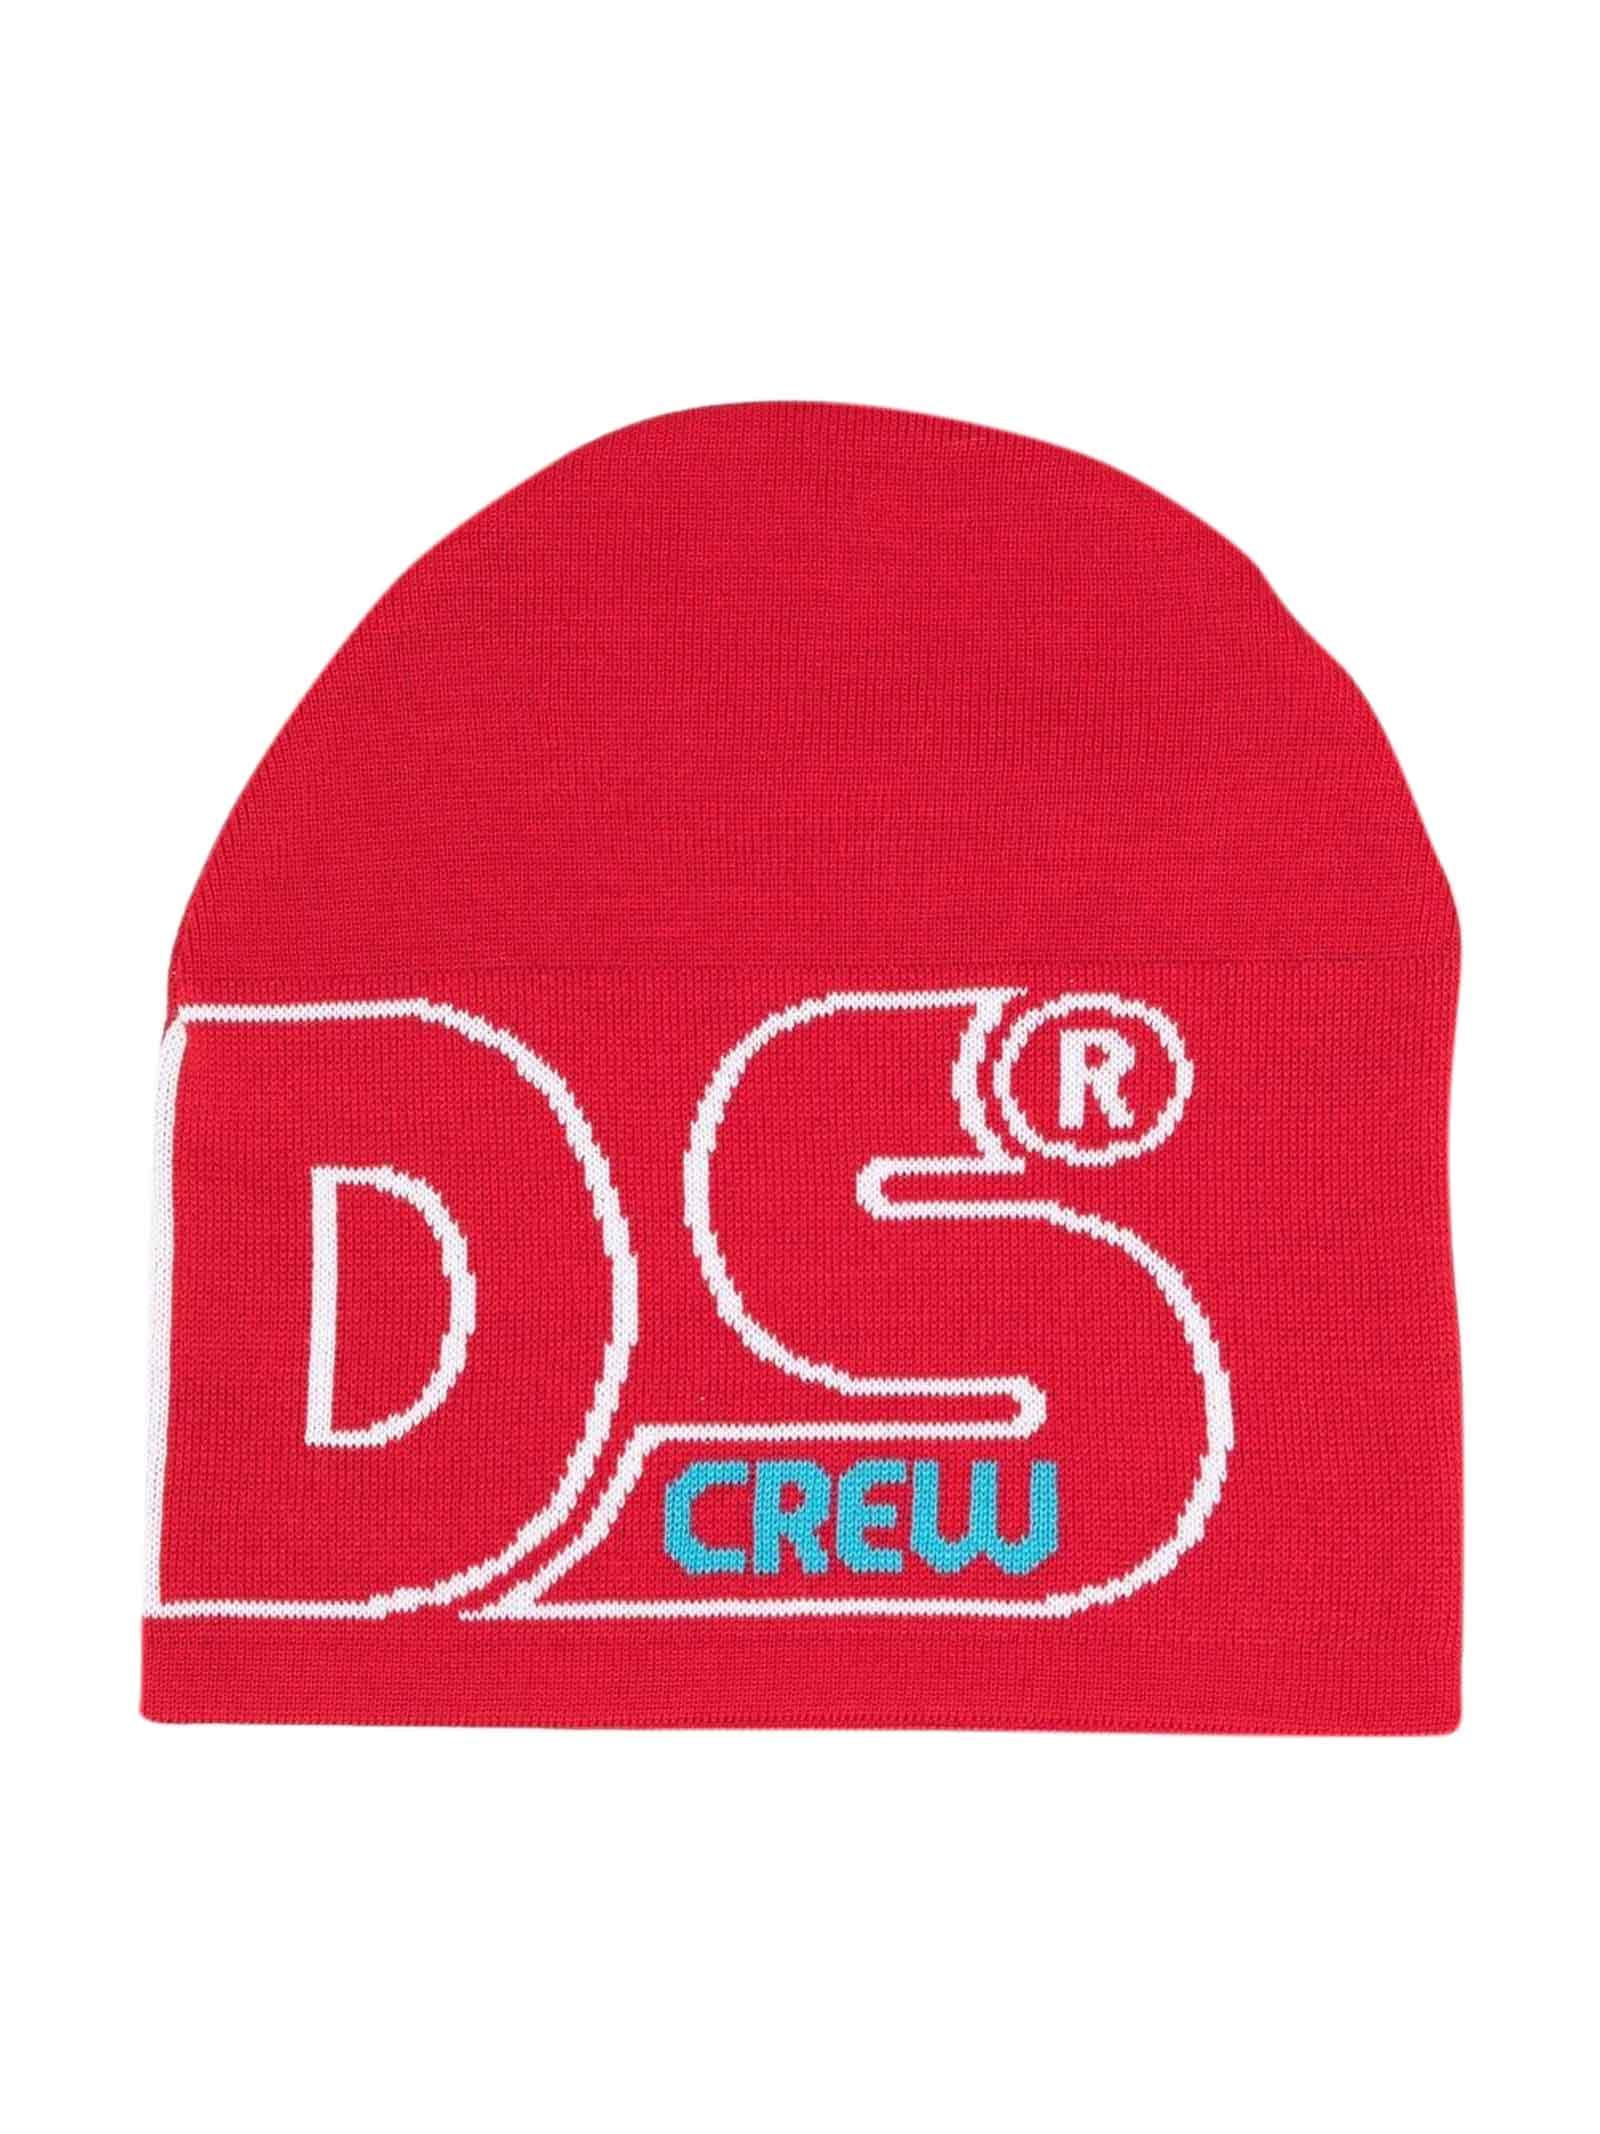 Red Baby Cap